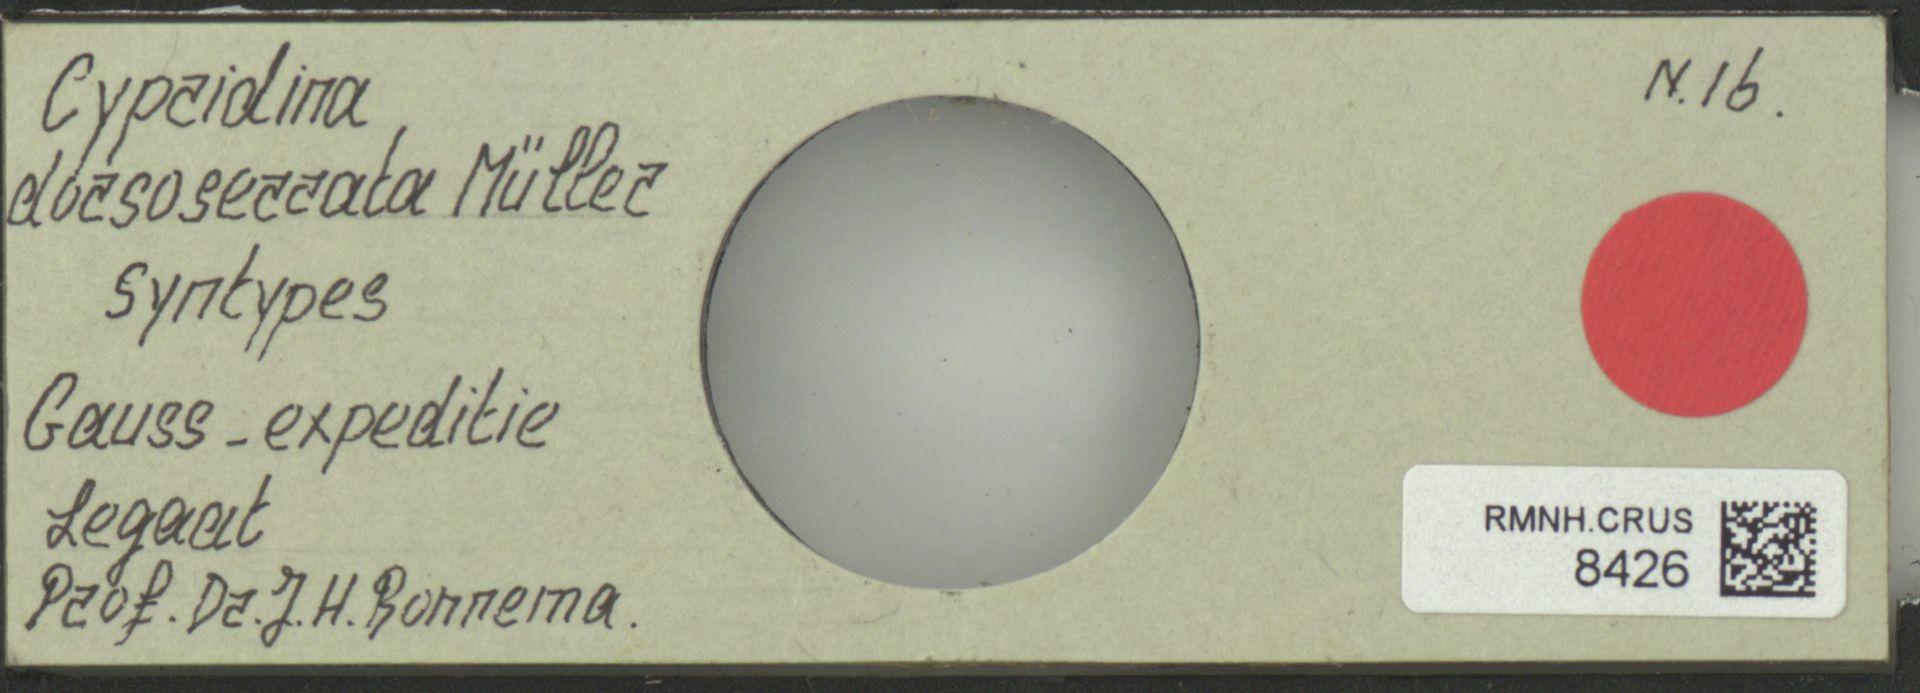 RMNH.CRUS.8426 | Cypridina dorsoserrata Müller